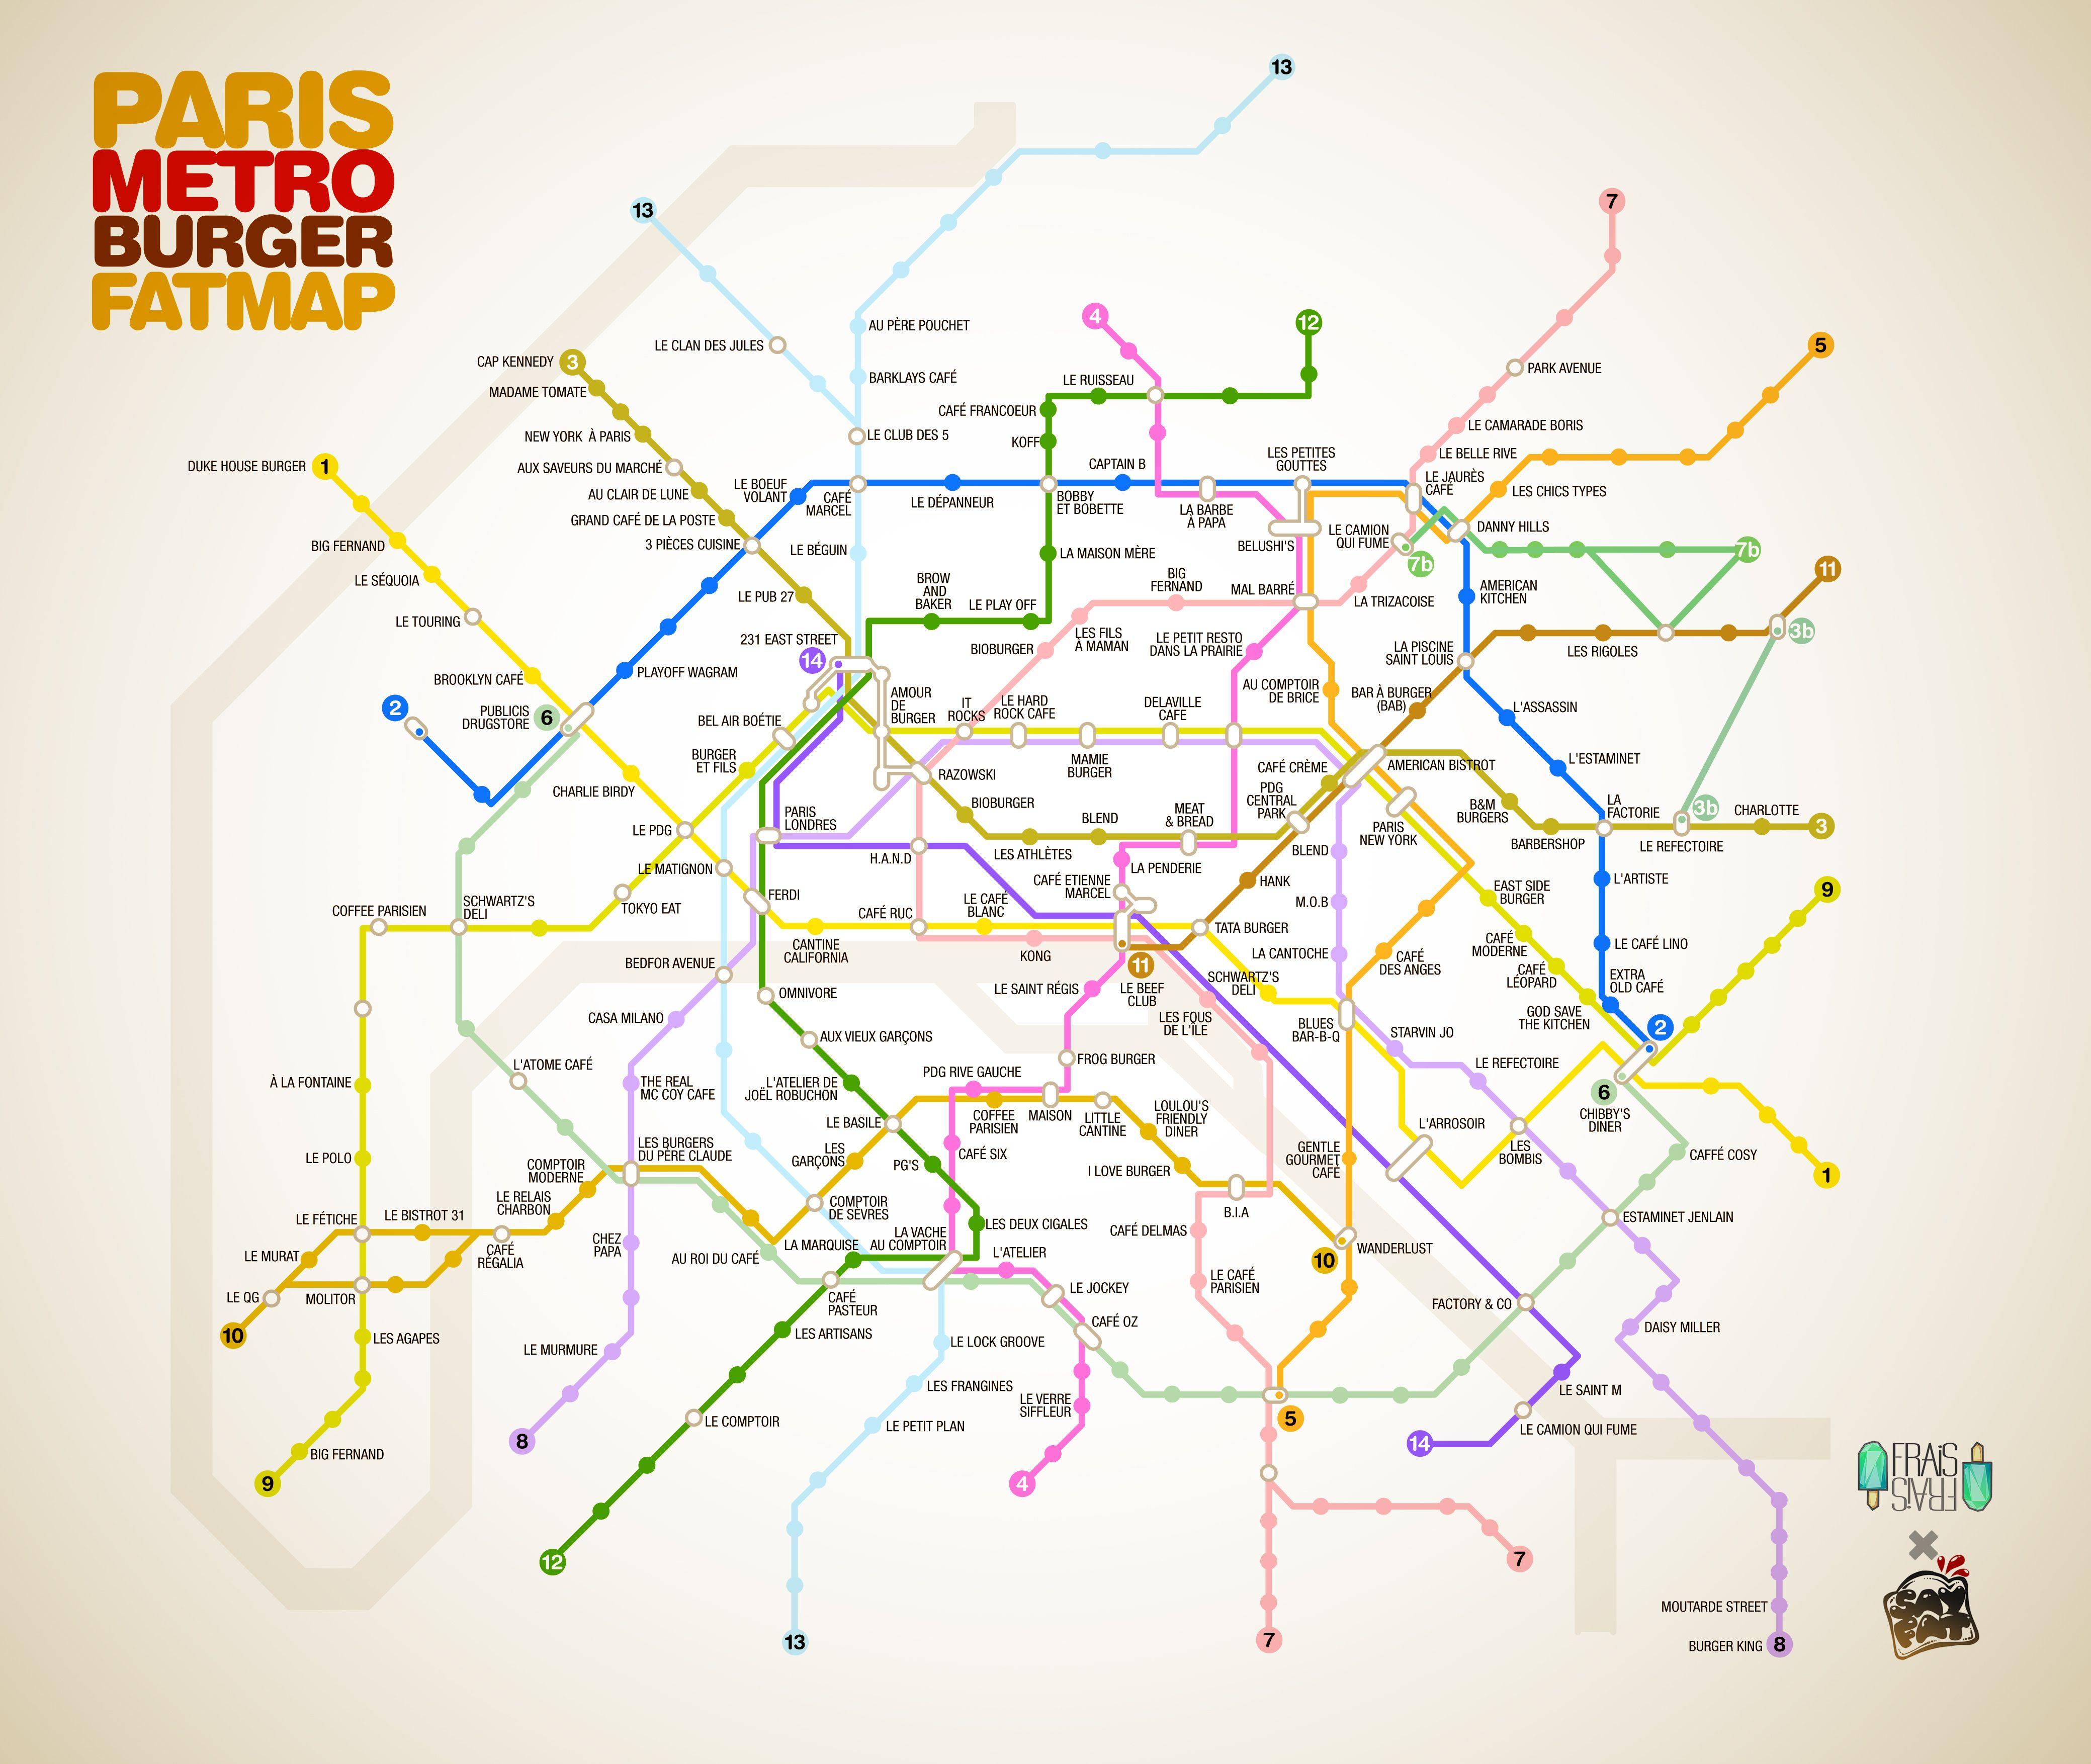 Paris Metro Burger Map